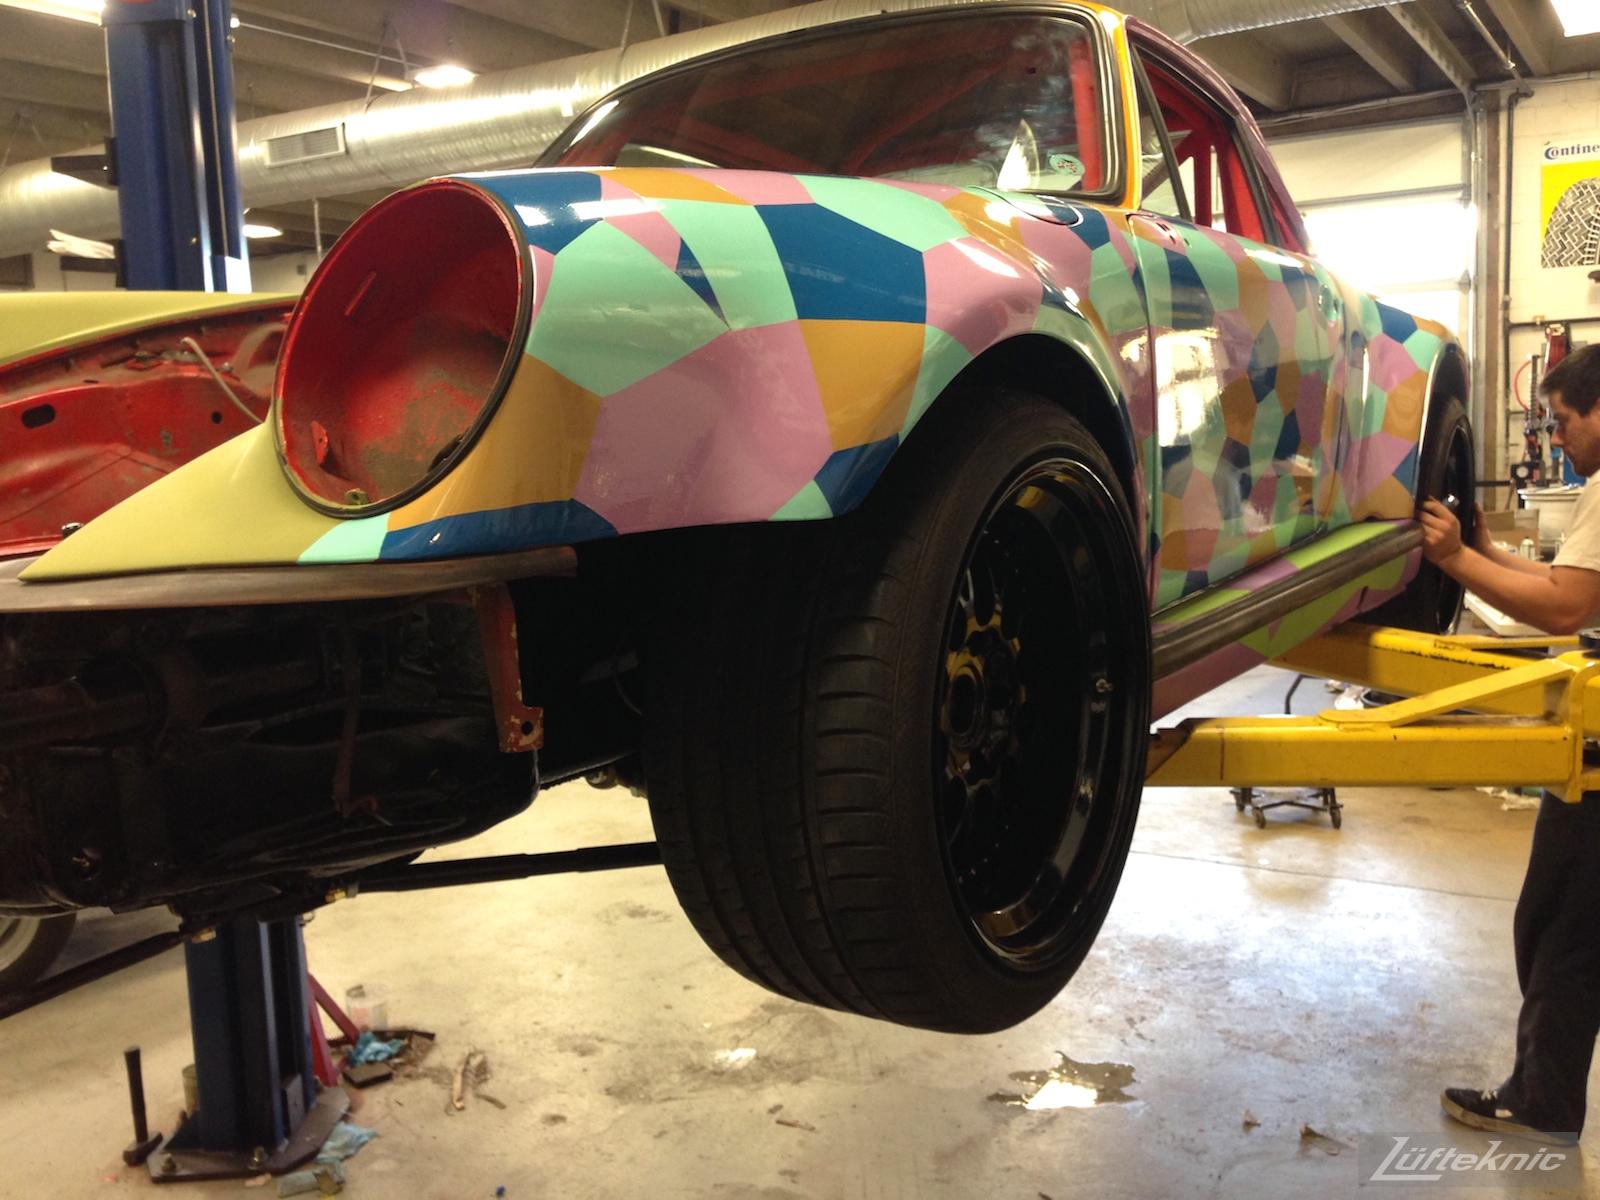 Lüfteknic #projectstuka Porsche 930 Turbo wheel fitment with tires.